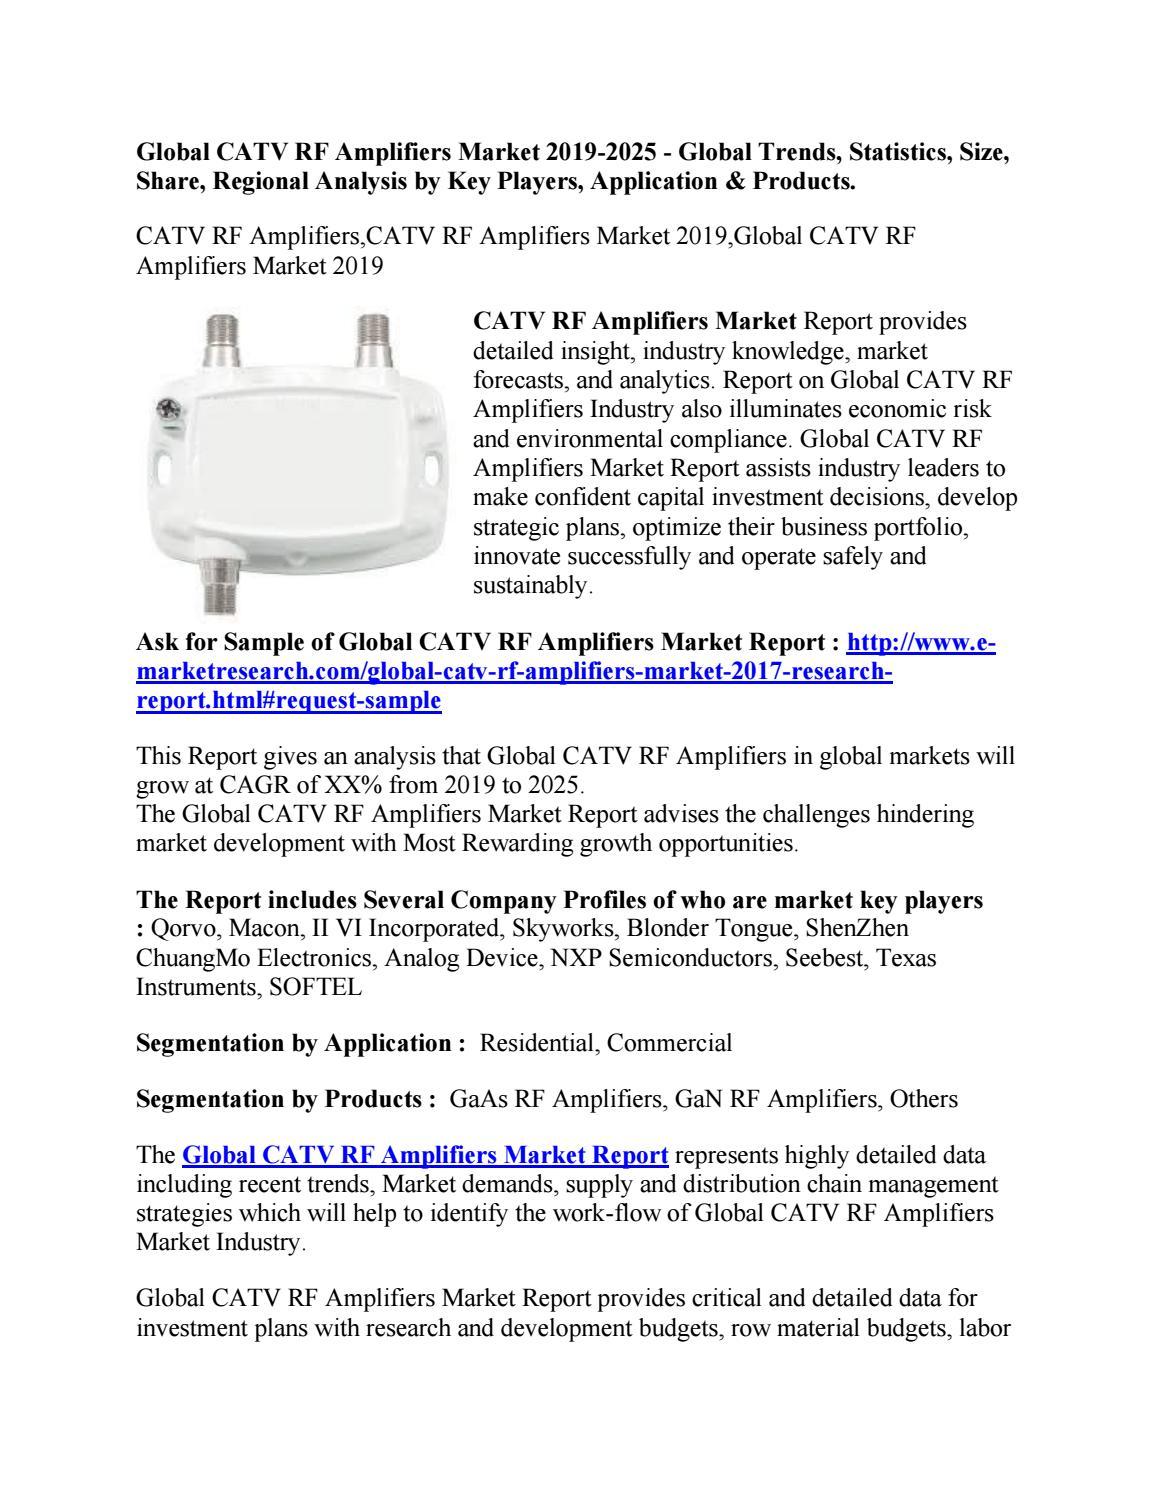 Global CATV RF Amplifiers Market 2019-2025 - Global Trends